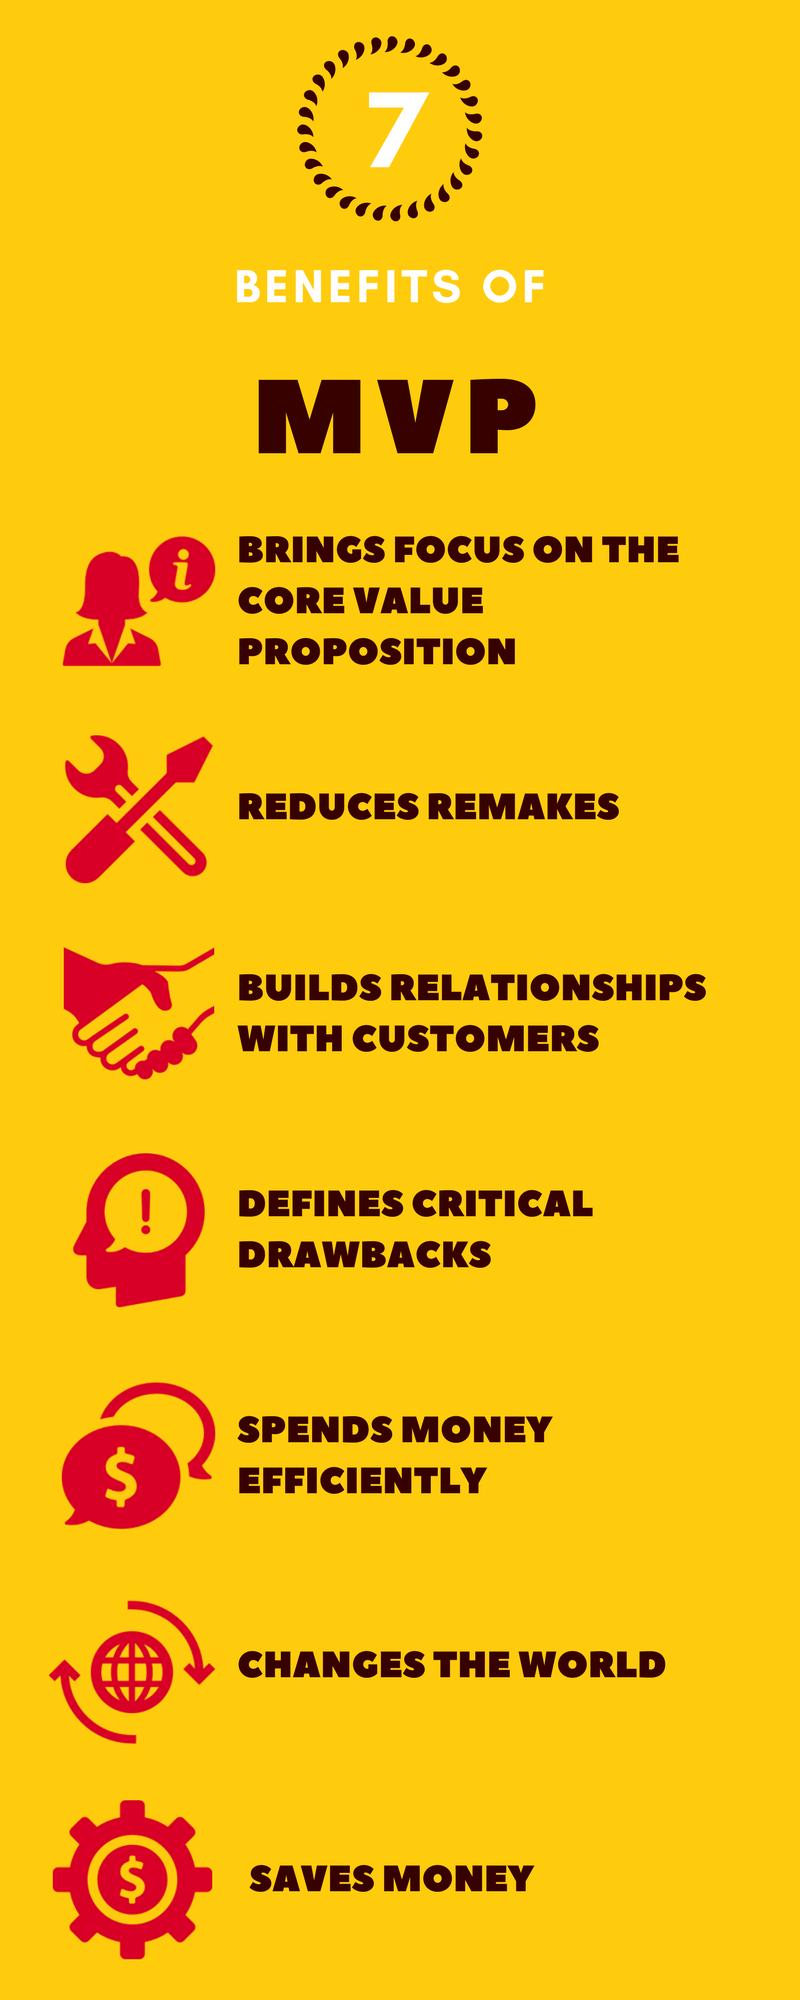 mvp_benefits - Blog S-pro